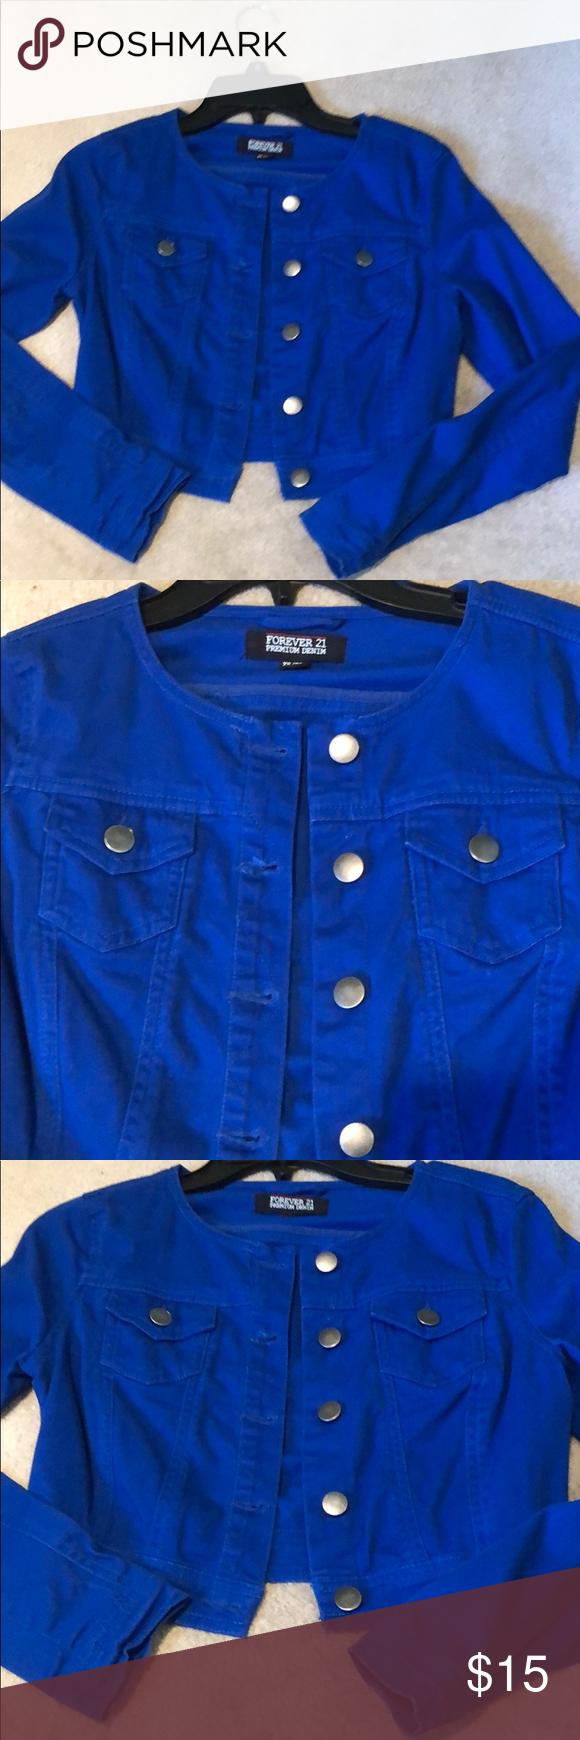 Cropped Royal Blue Jean Jacket Style Xsmall Jean Jacket Styles Blue Jean Jacket Royal Blue Jeans [ 1740 x 580 Pixel ]